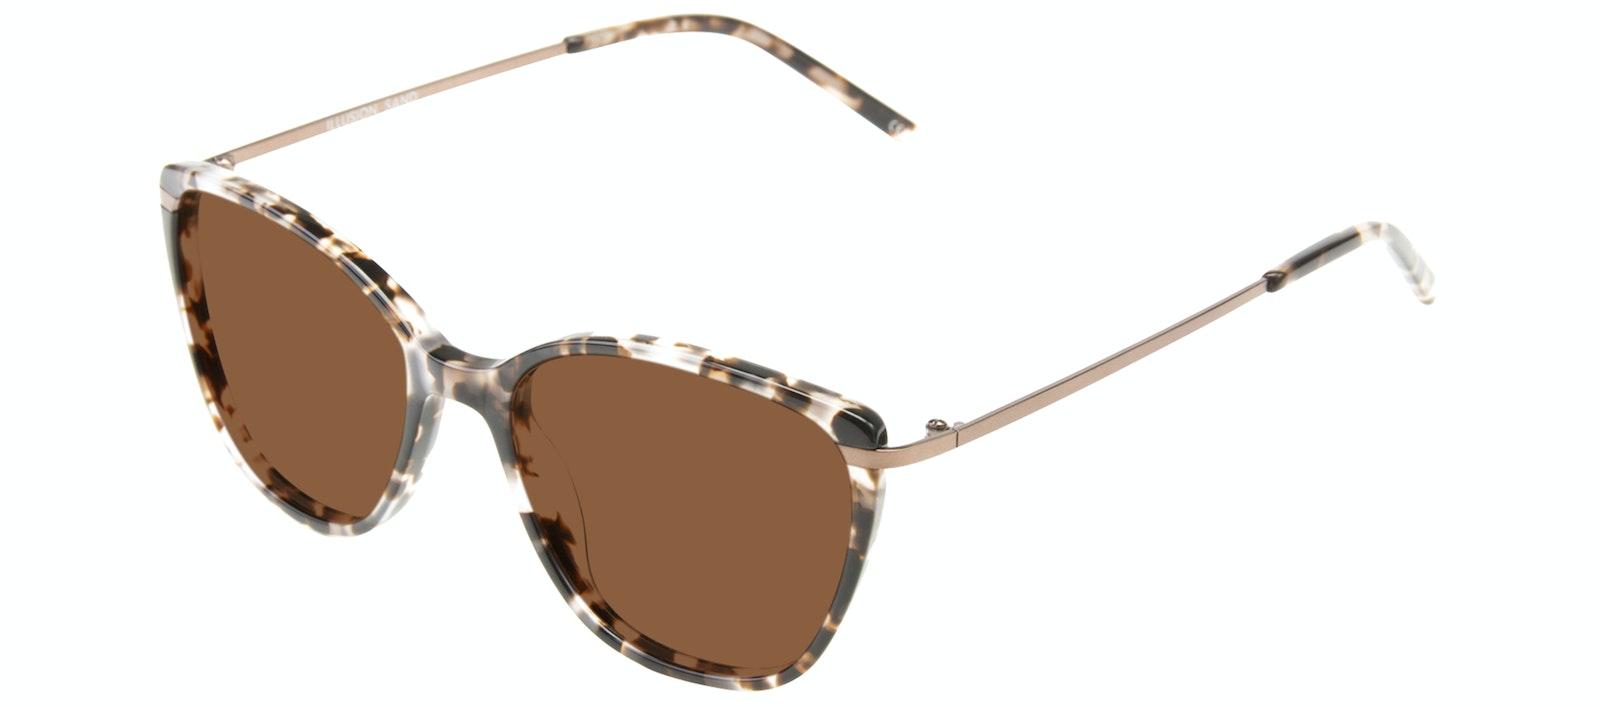 Affordable Fashion Glasses Rectangle Square Sunglasses Women Illusion Sand Tilt